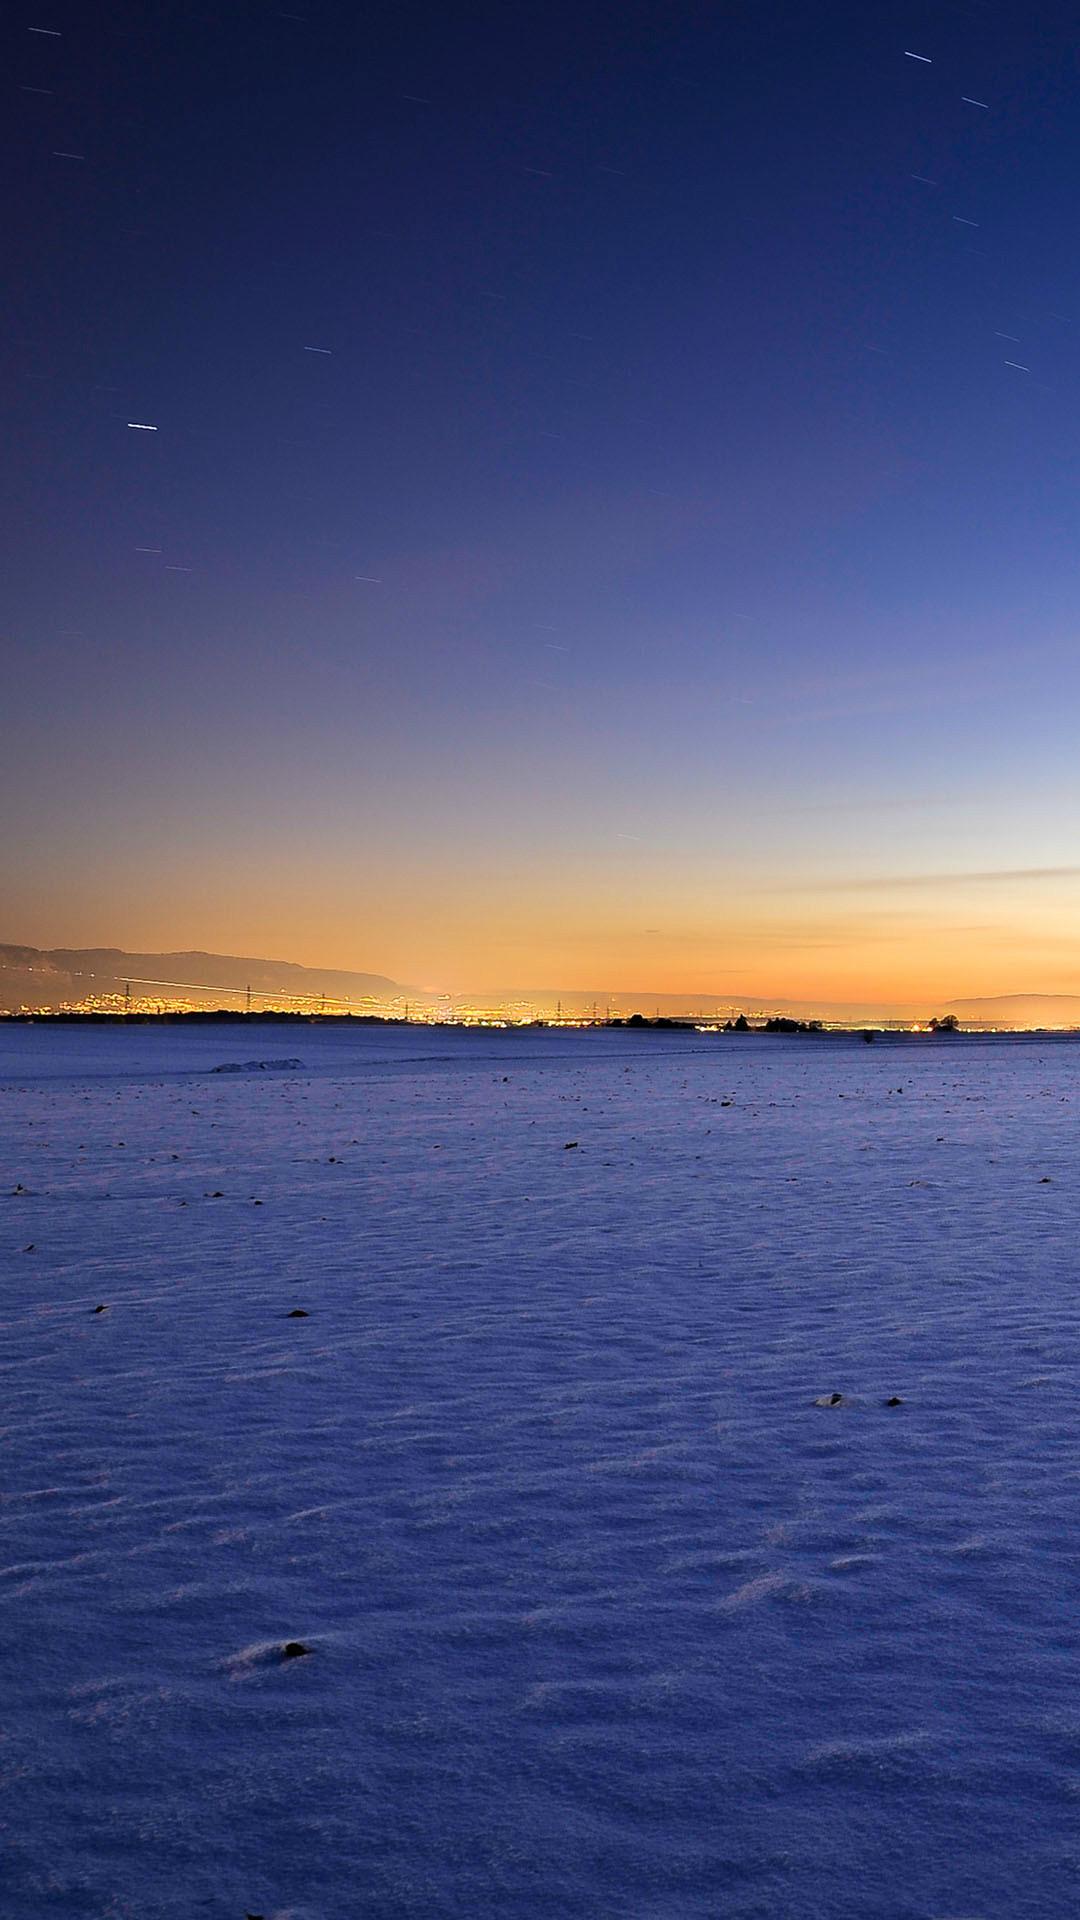 Freezing Night in Switzerland Star Trails Sky #iPhone #7 #wallpaper